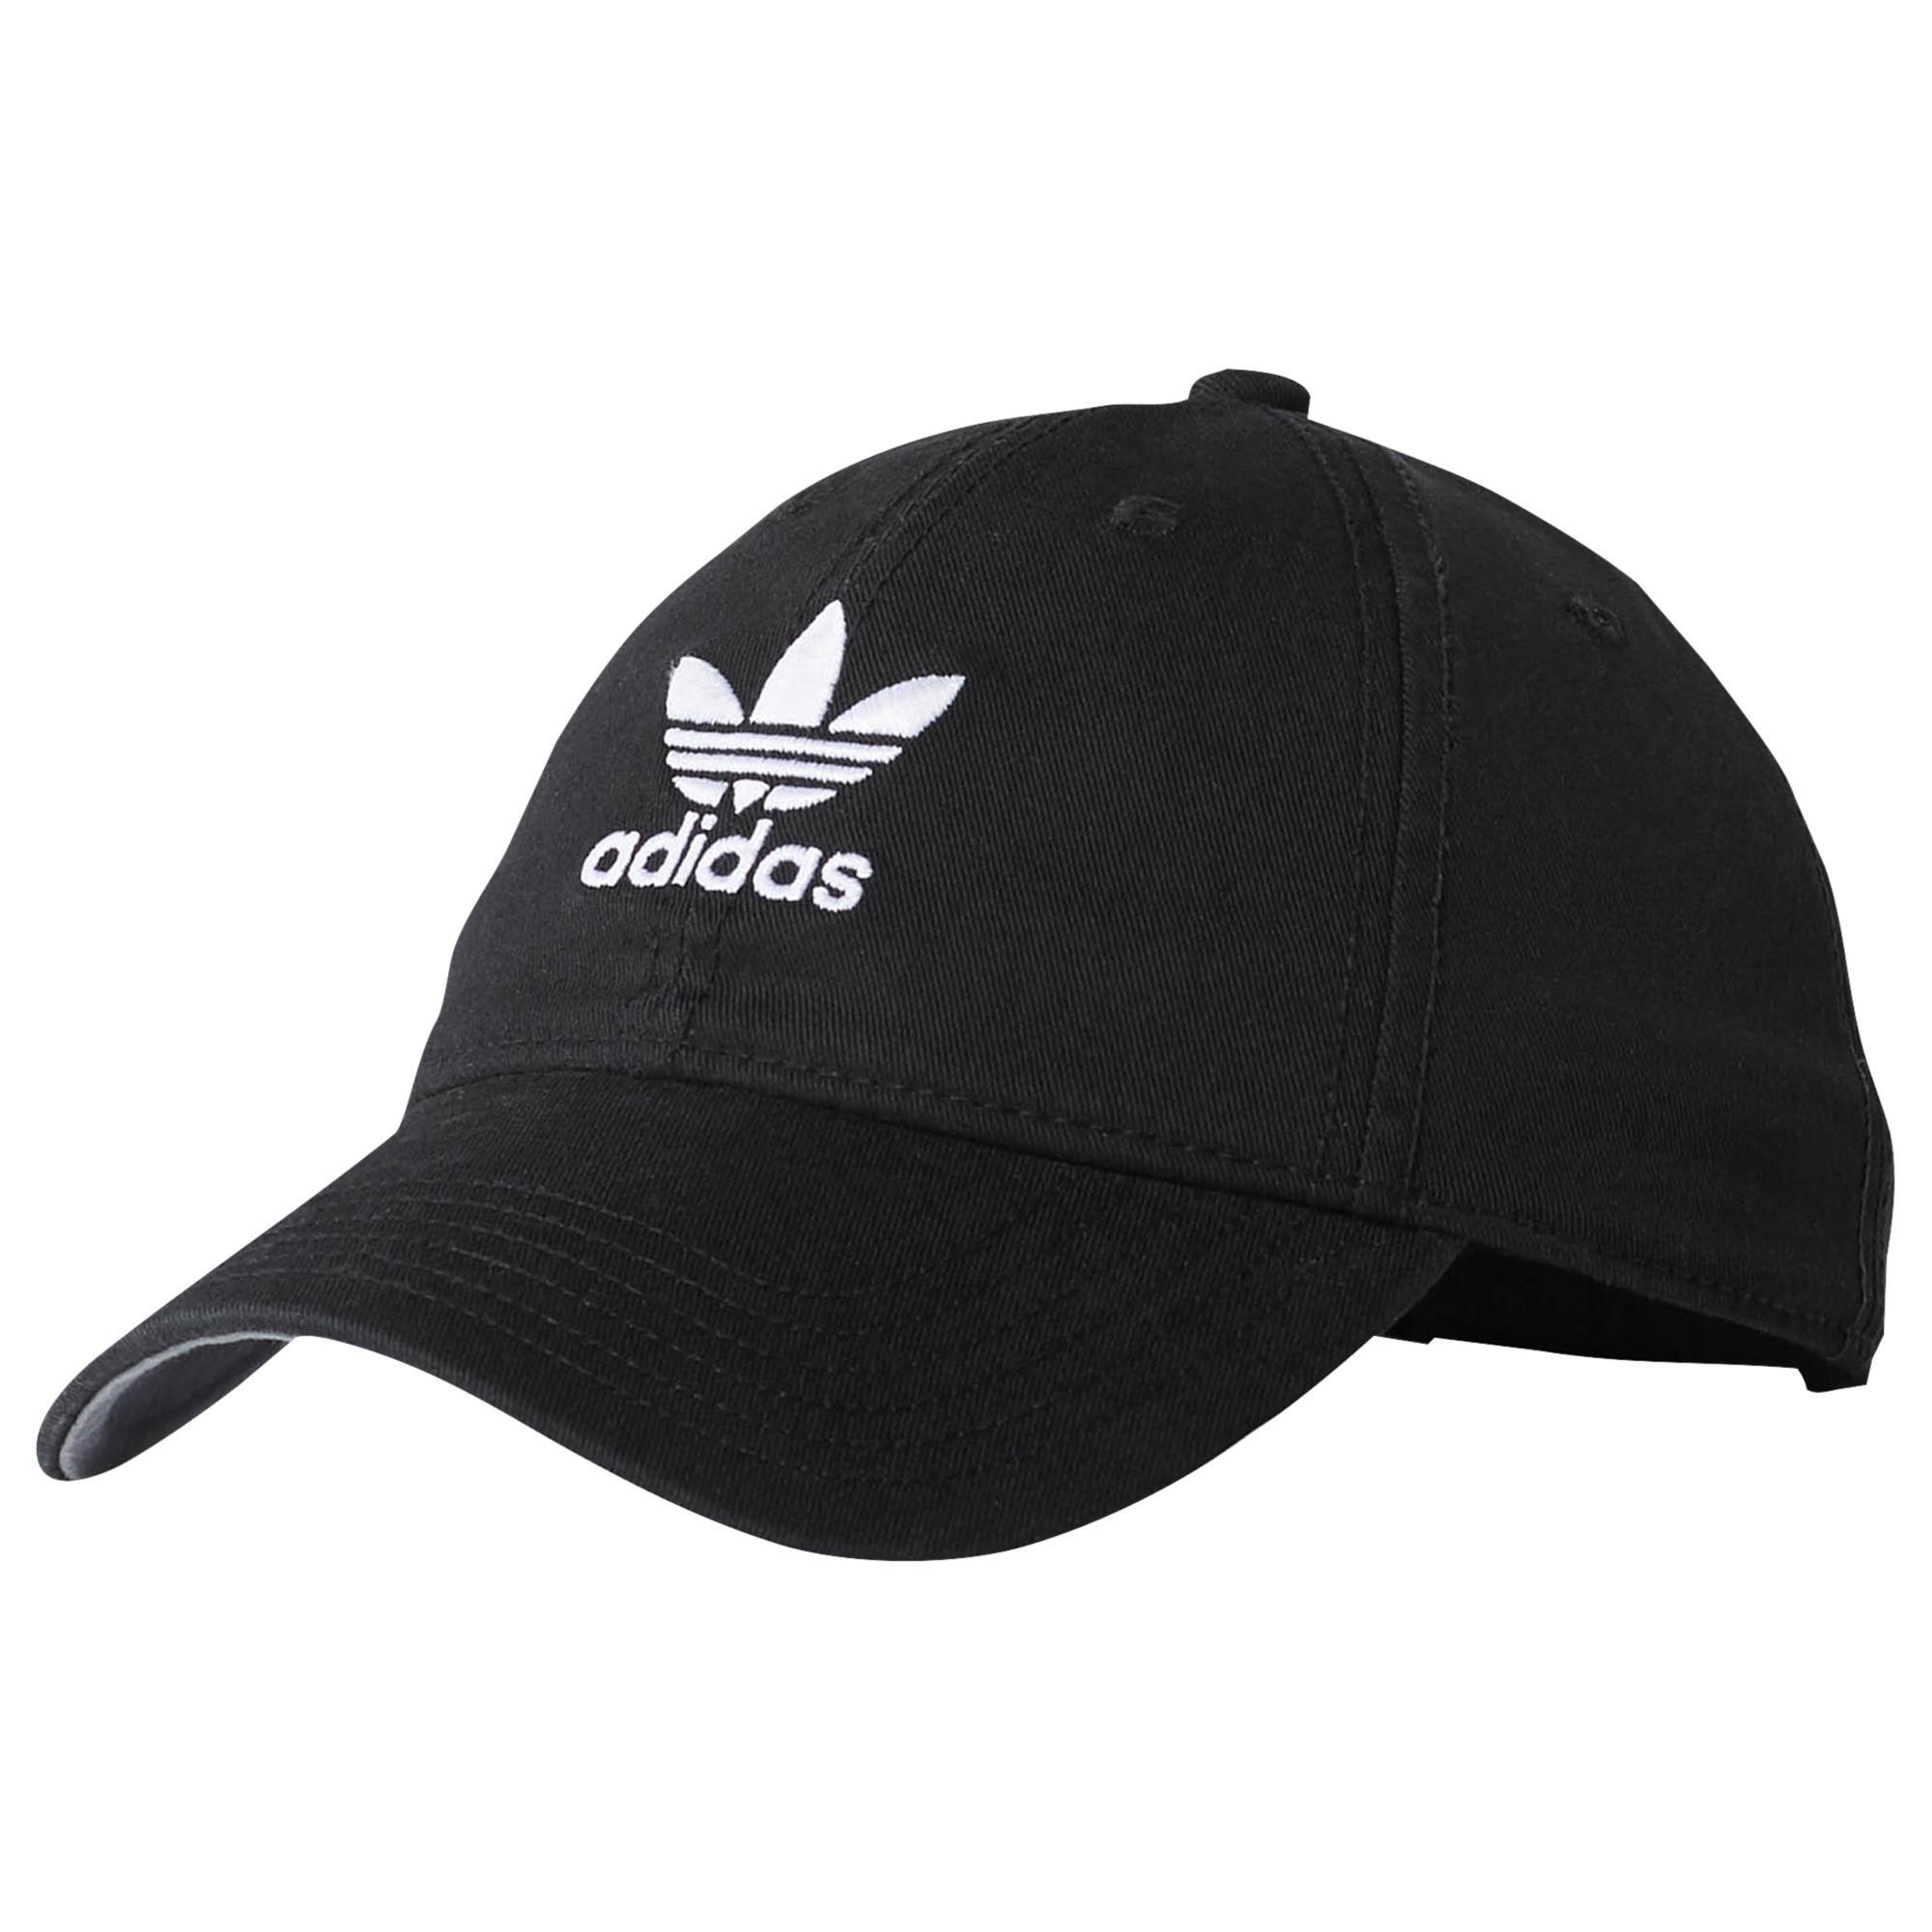 f2591db171b Lyst - Adidas Originals Relaxed Strapback Hat in Black for Men